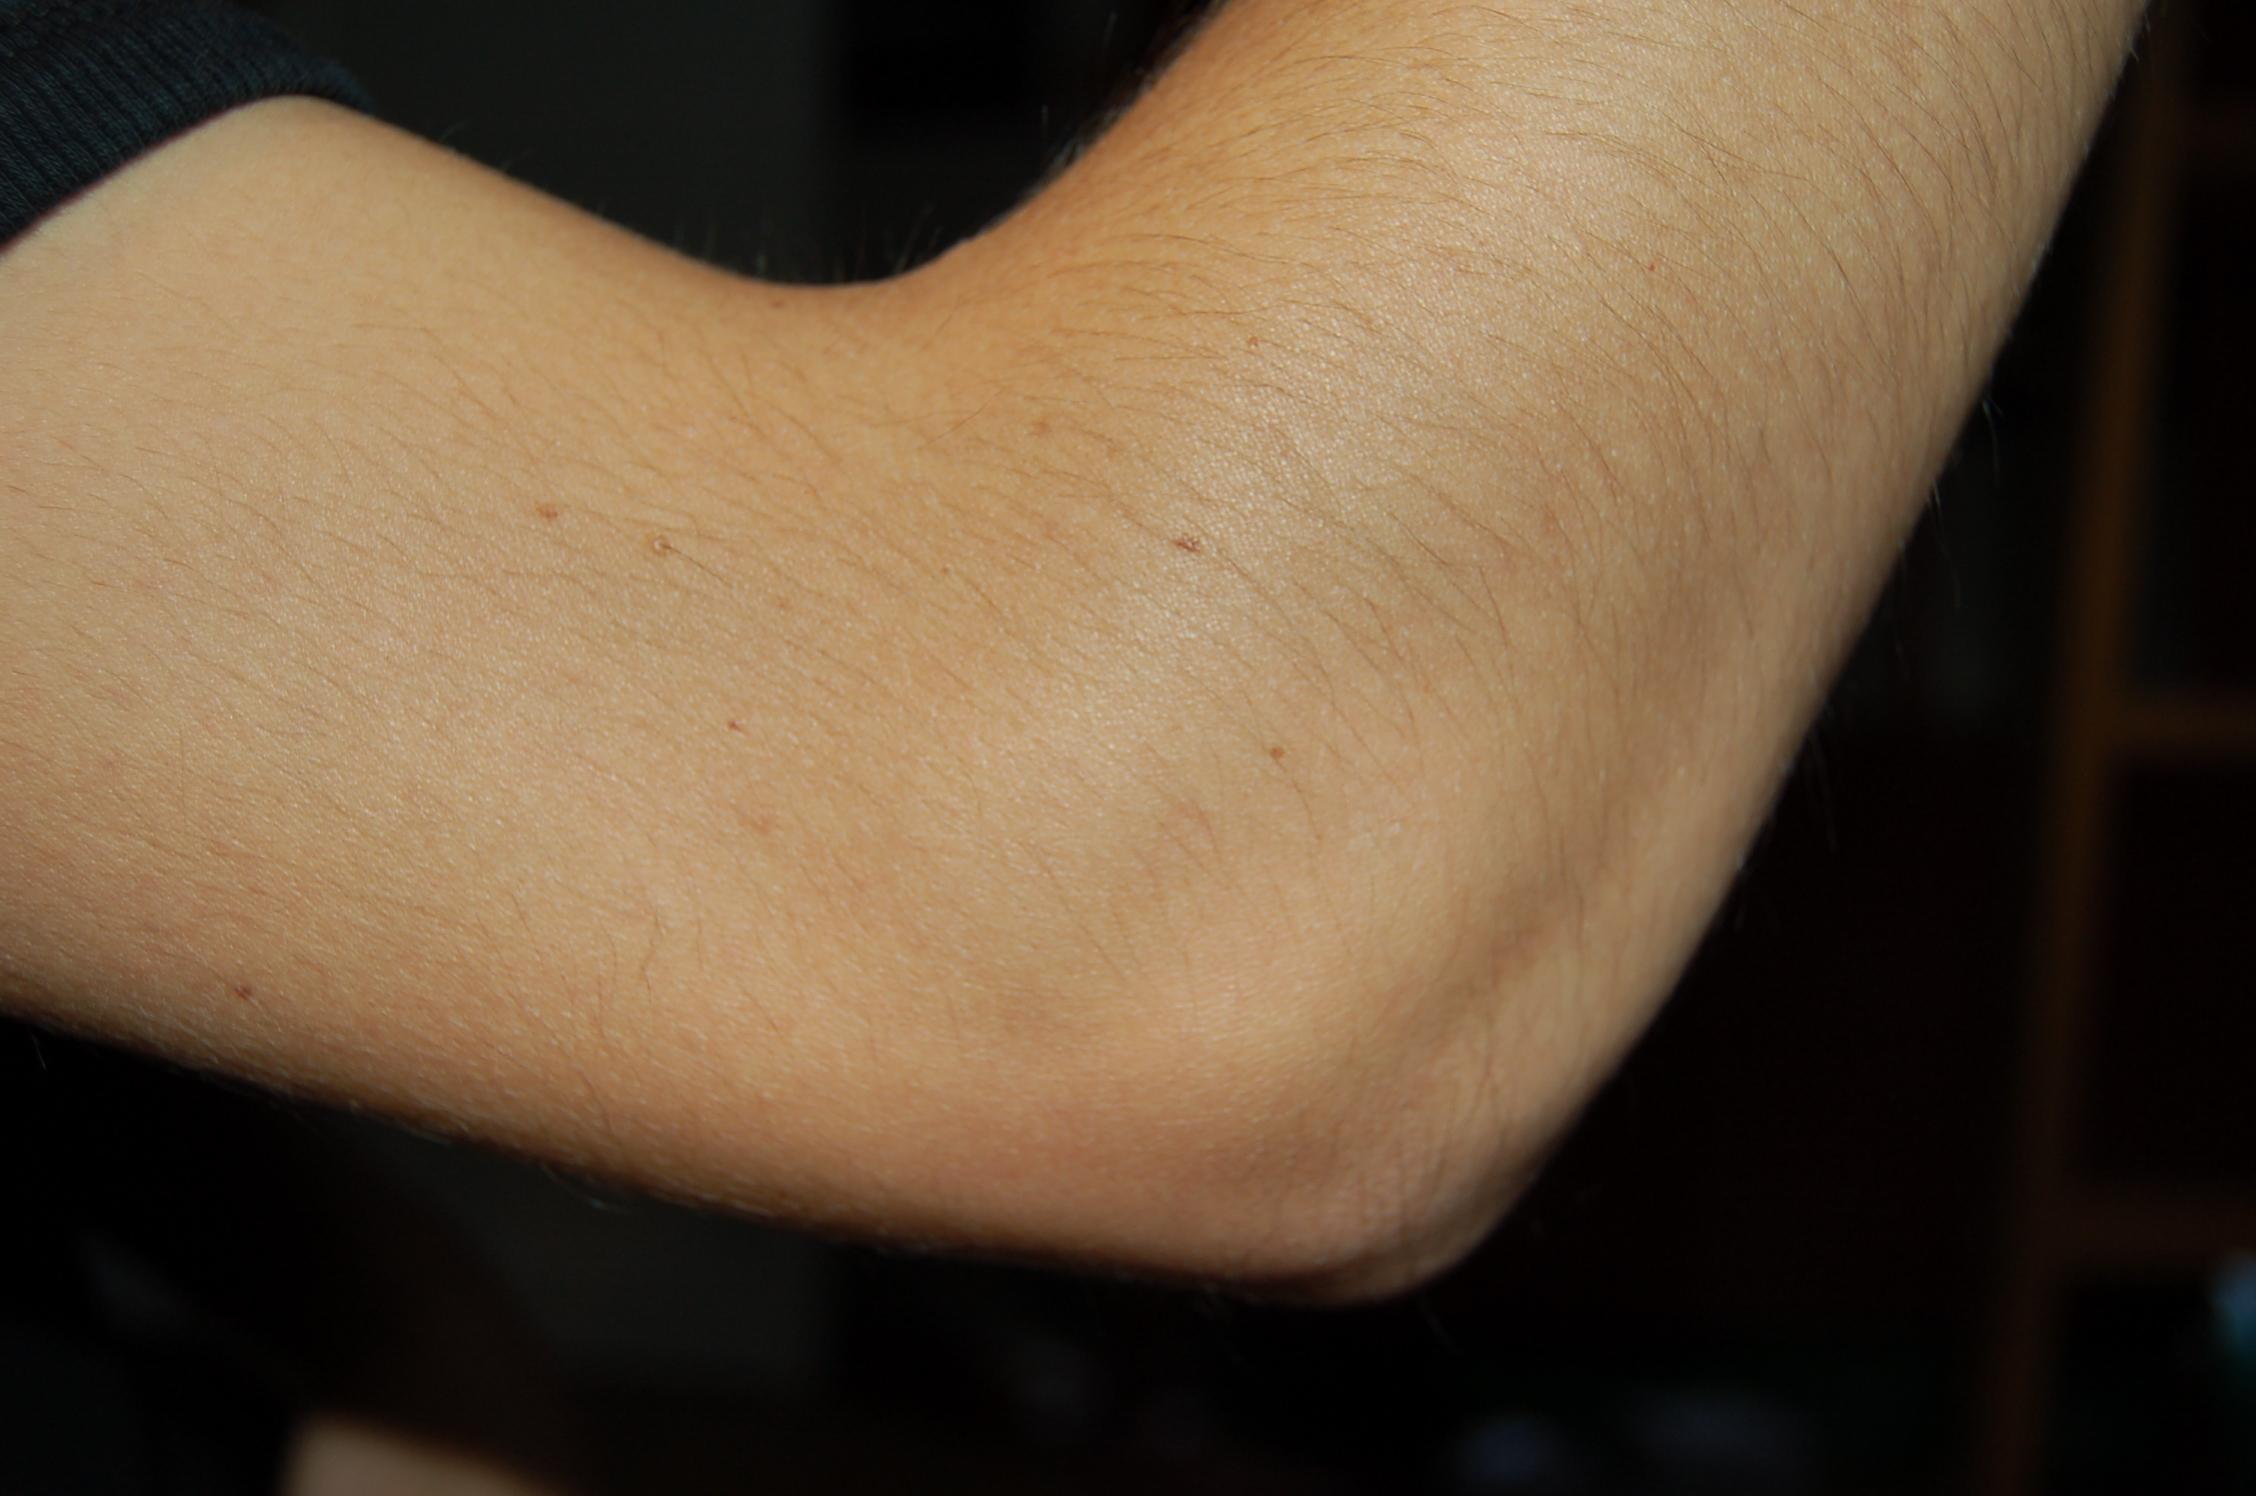 File:Elbow coude.JPG - Wikipedia